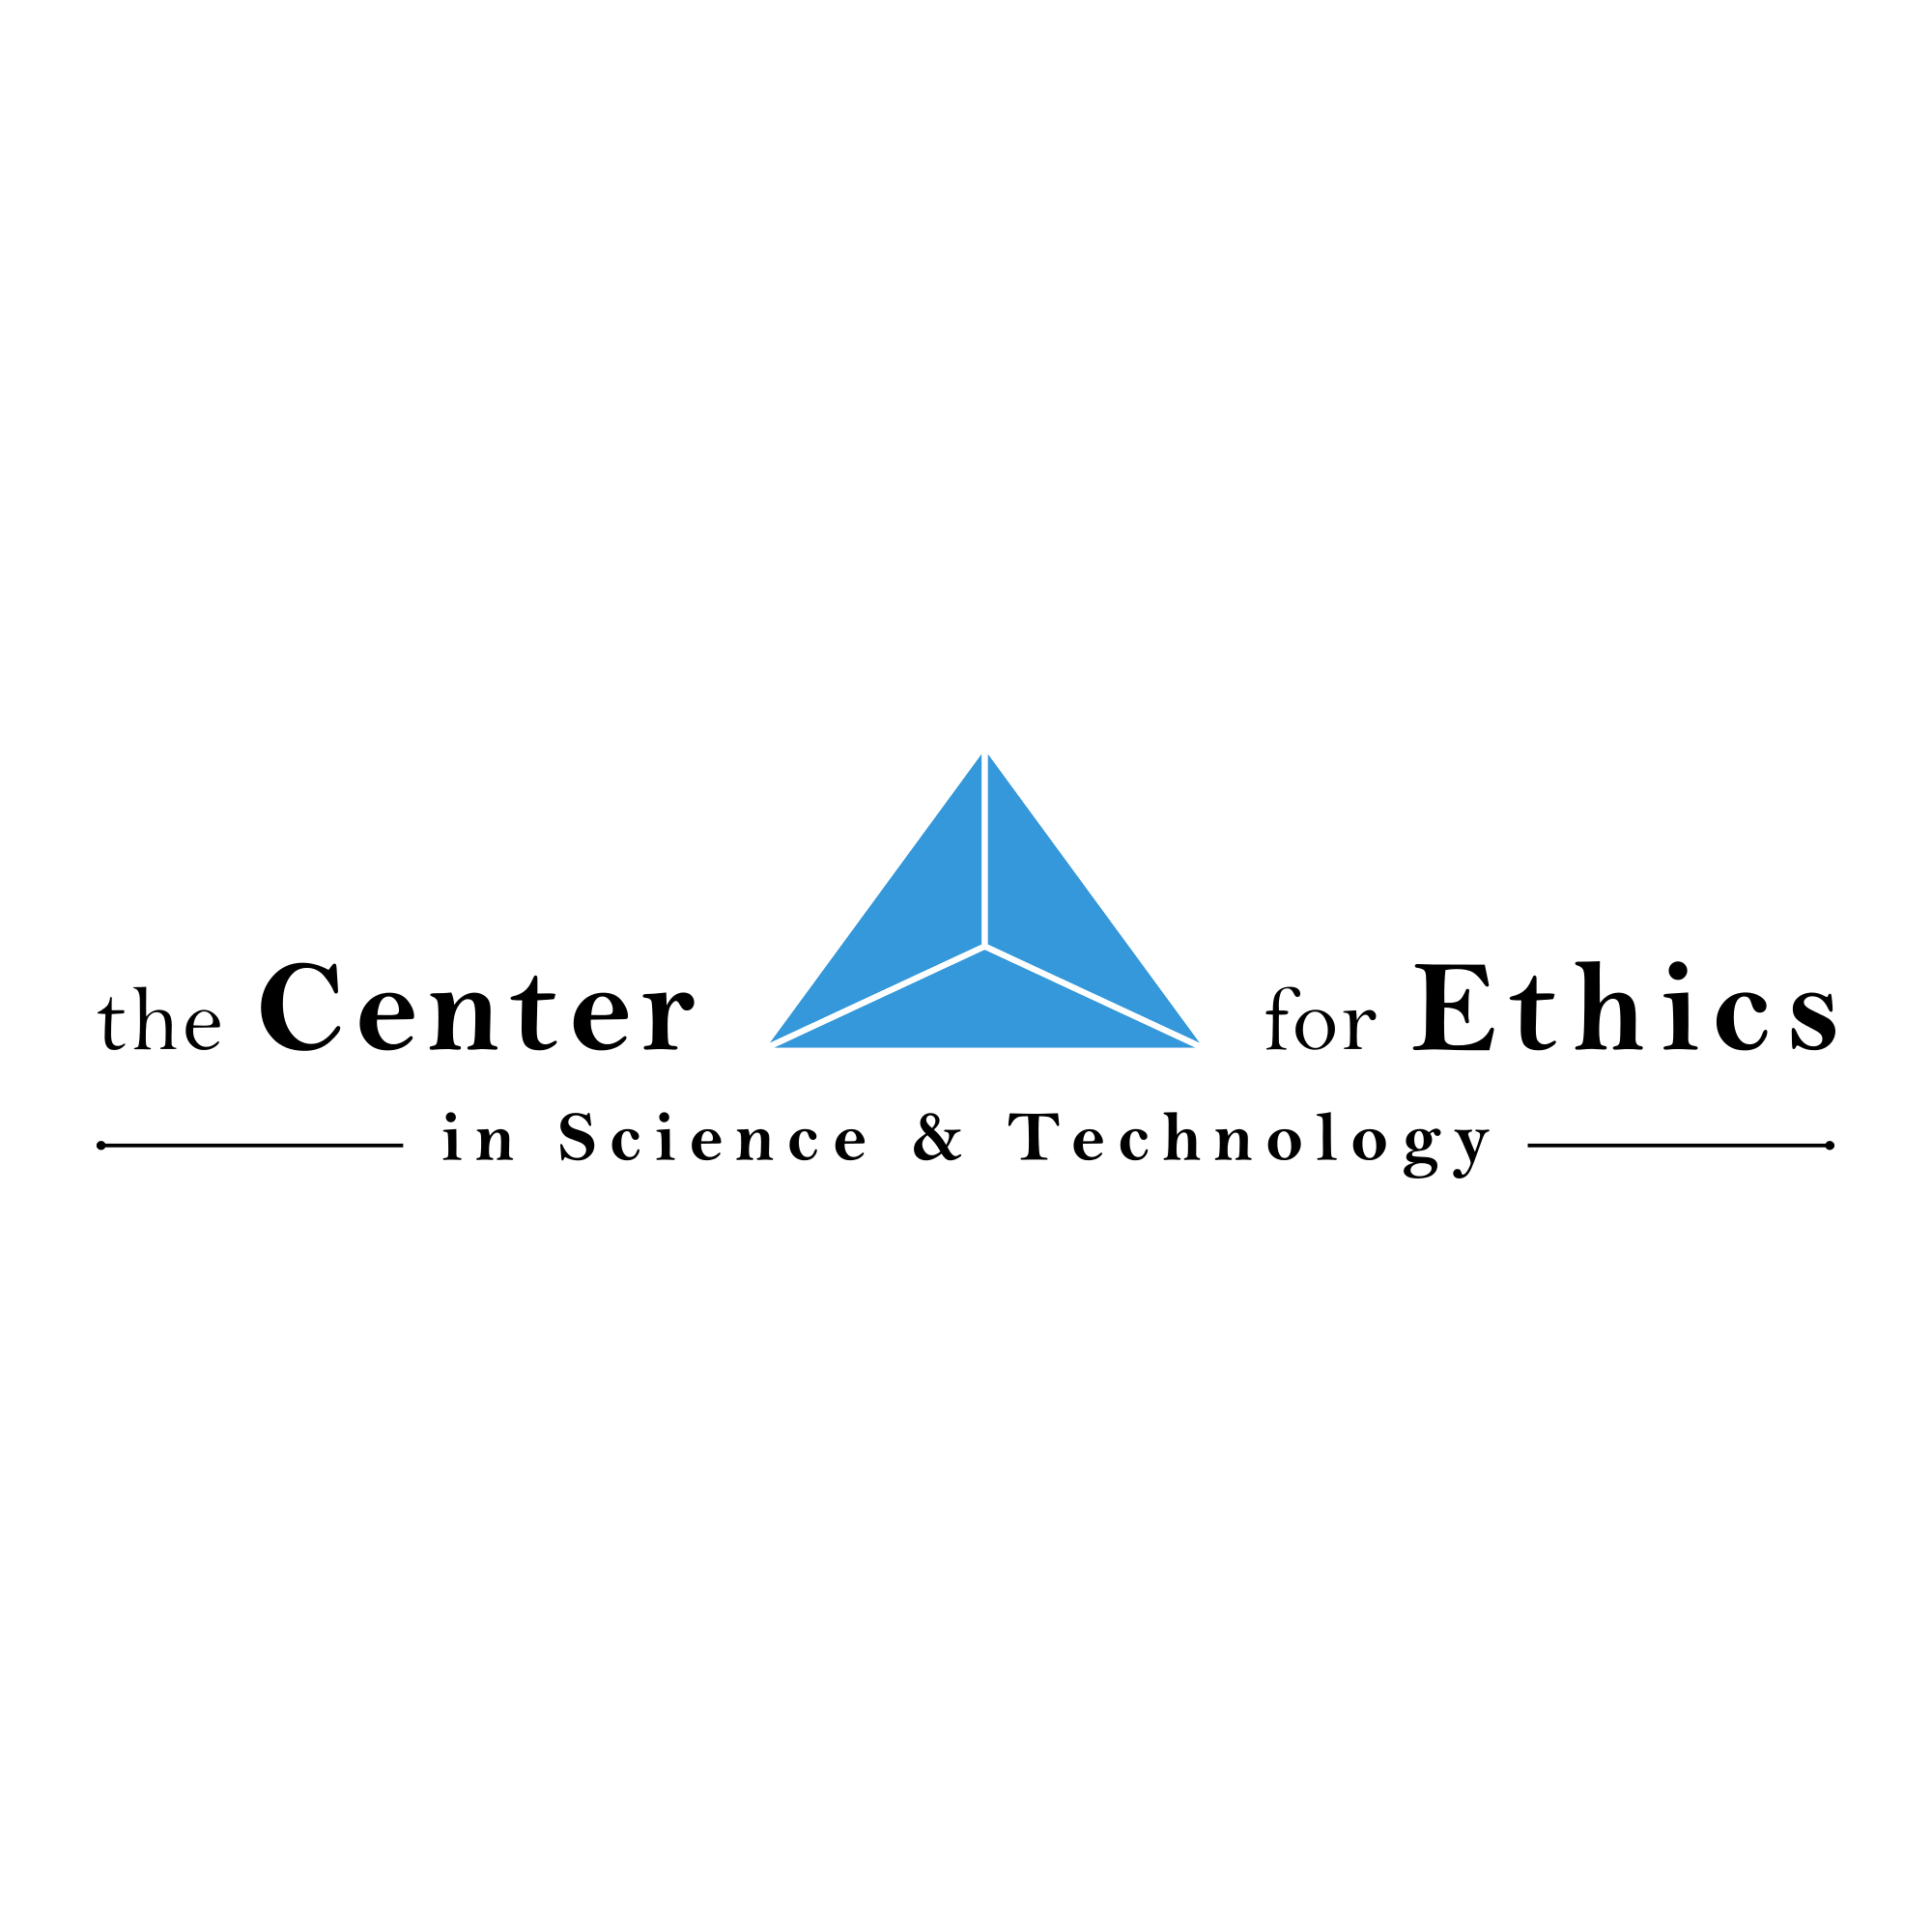 (c) Ethicscenter.net